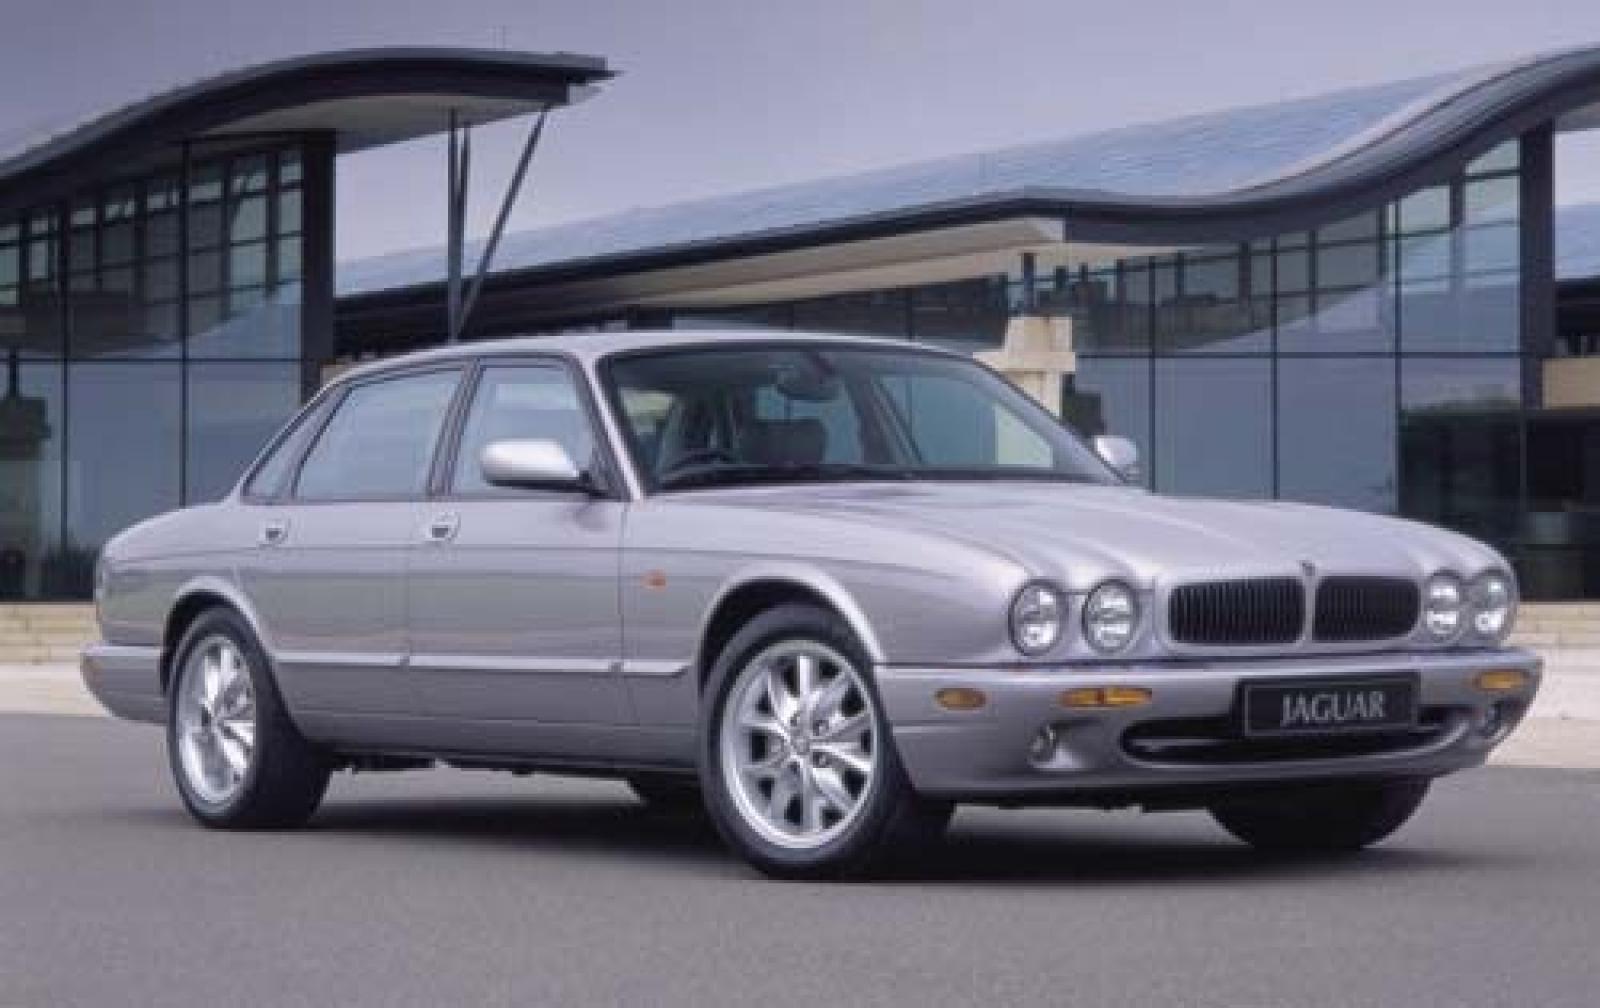 Charming 2003 Jaguar XJ Series #1 800 1024 1280 1600 Origin